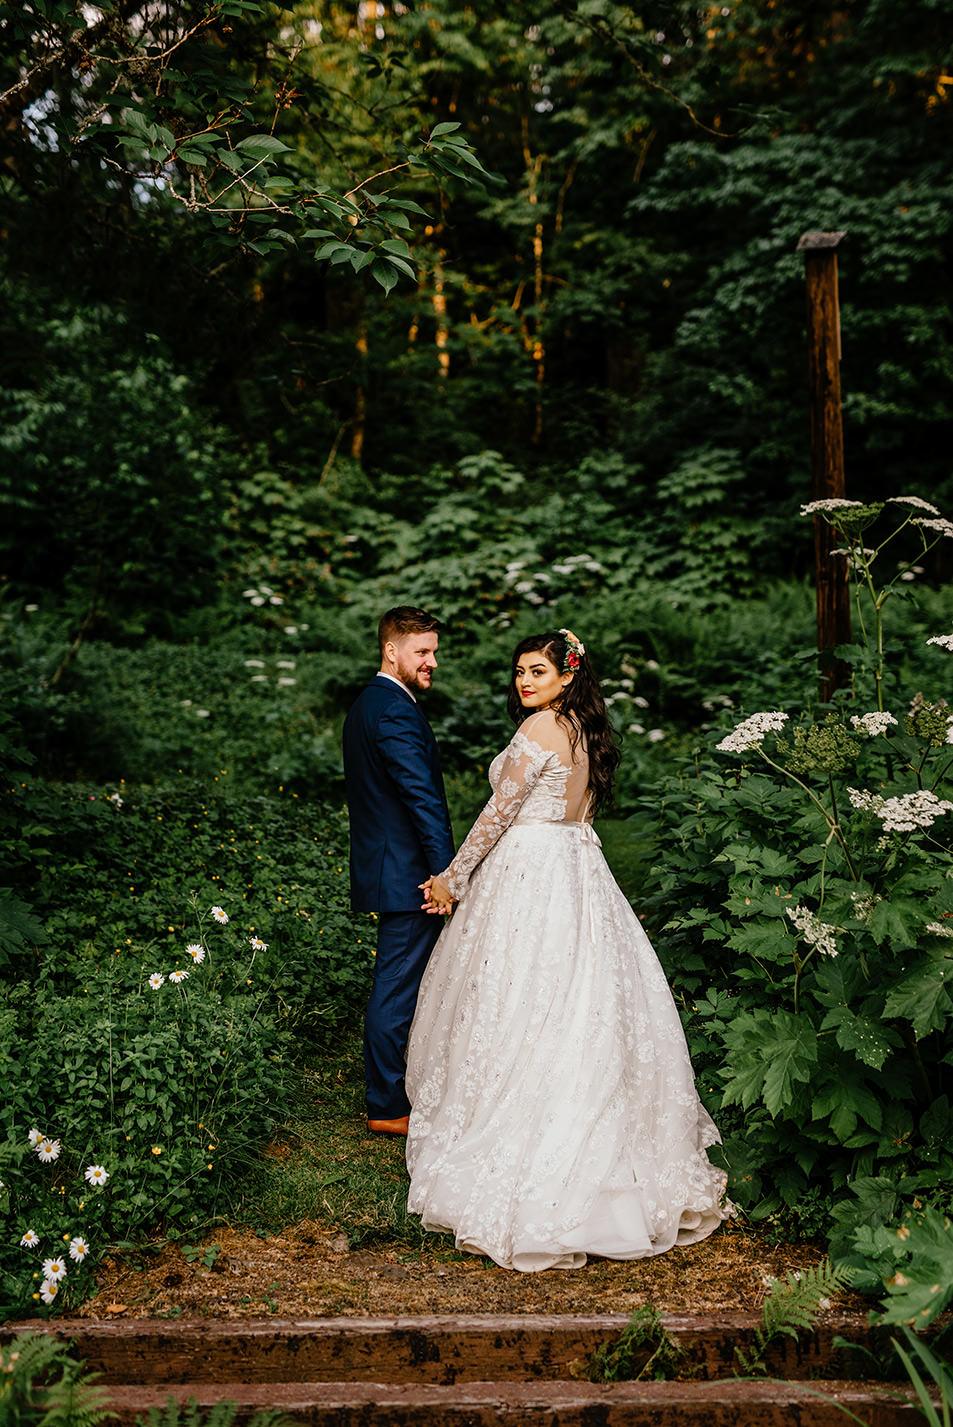 Spanish-inspired-wedding-bridal-veil-lakes-45.jpg